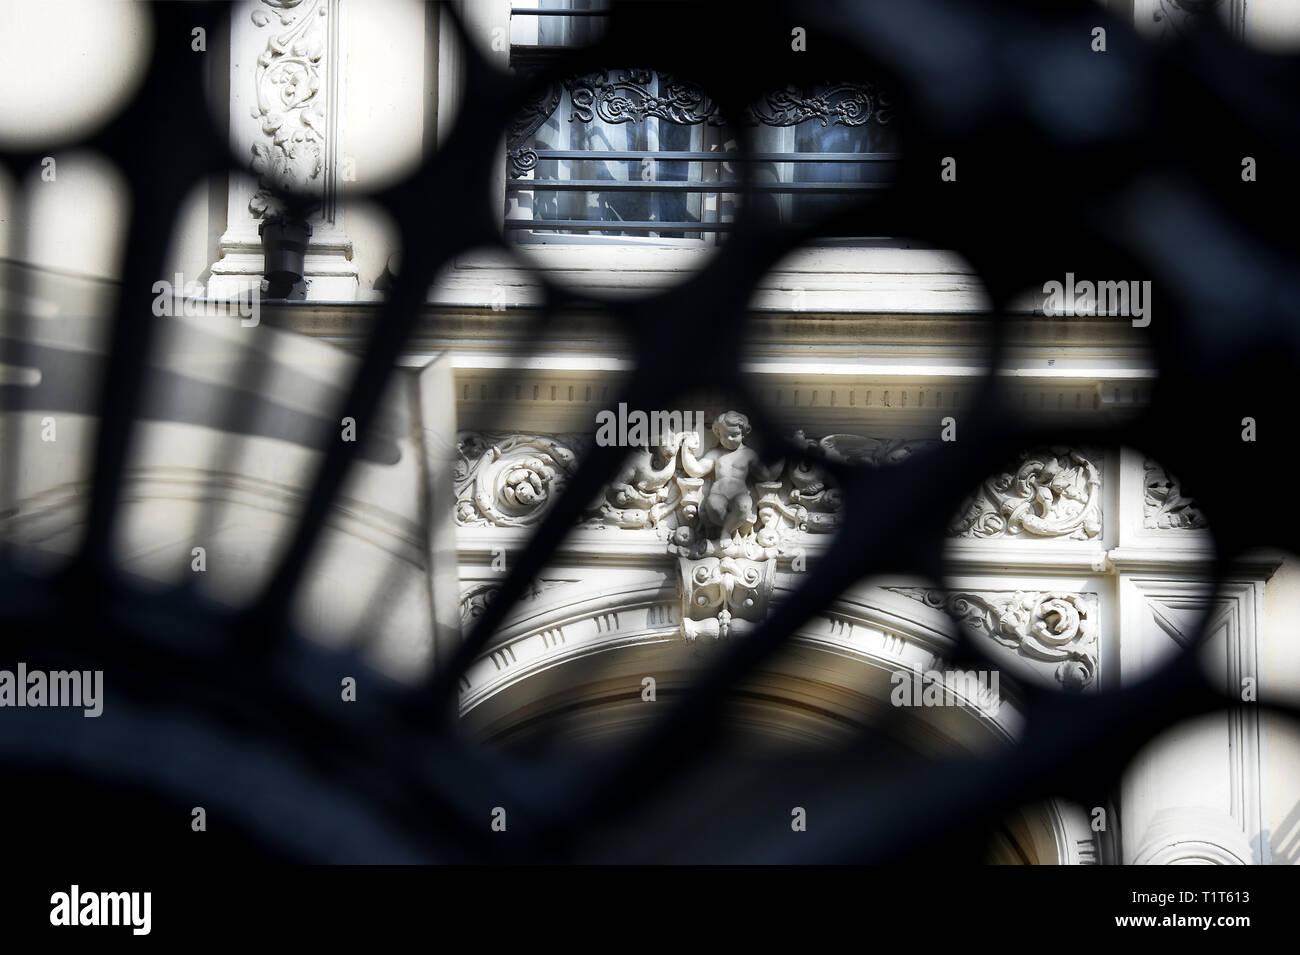 Details of a façade of a 19th century building - Paris 9th - France Stock Photo